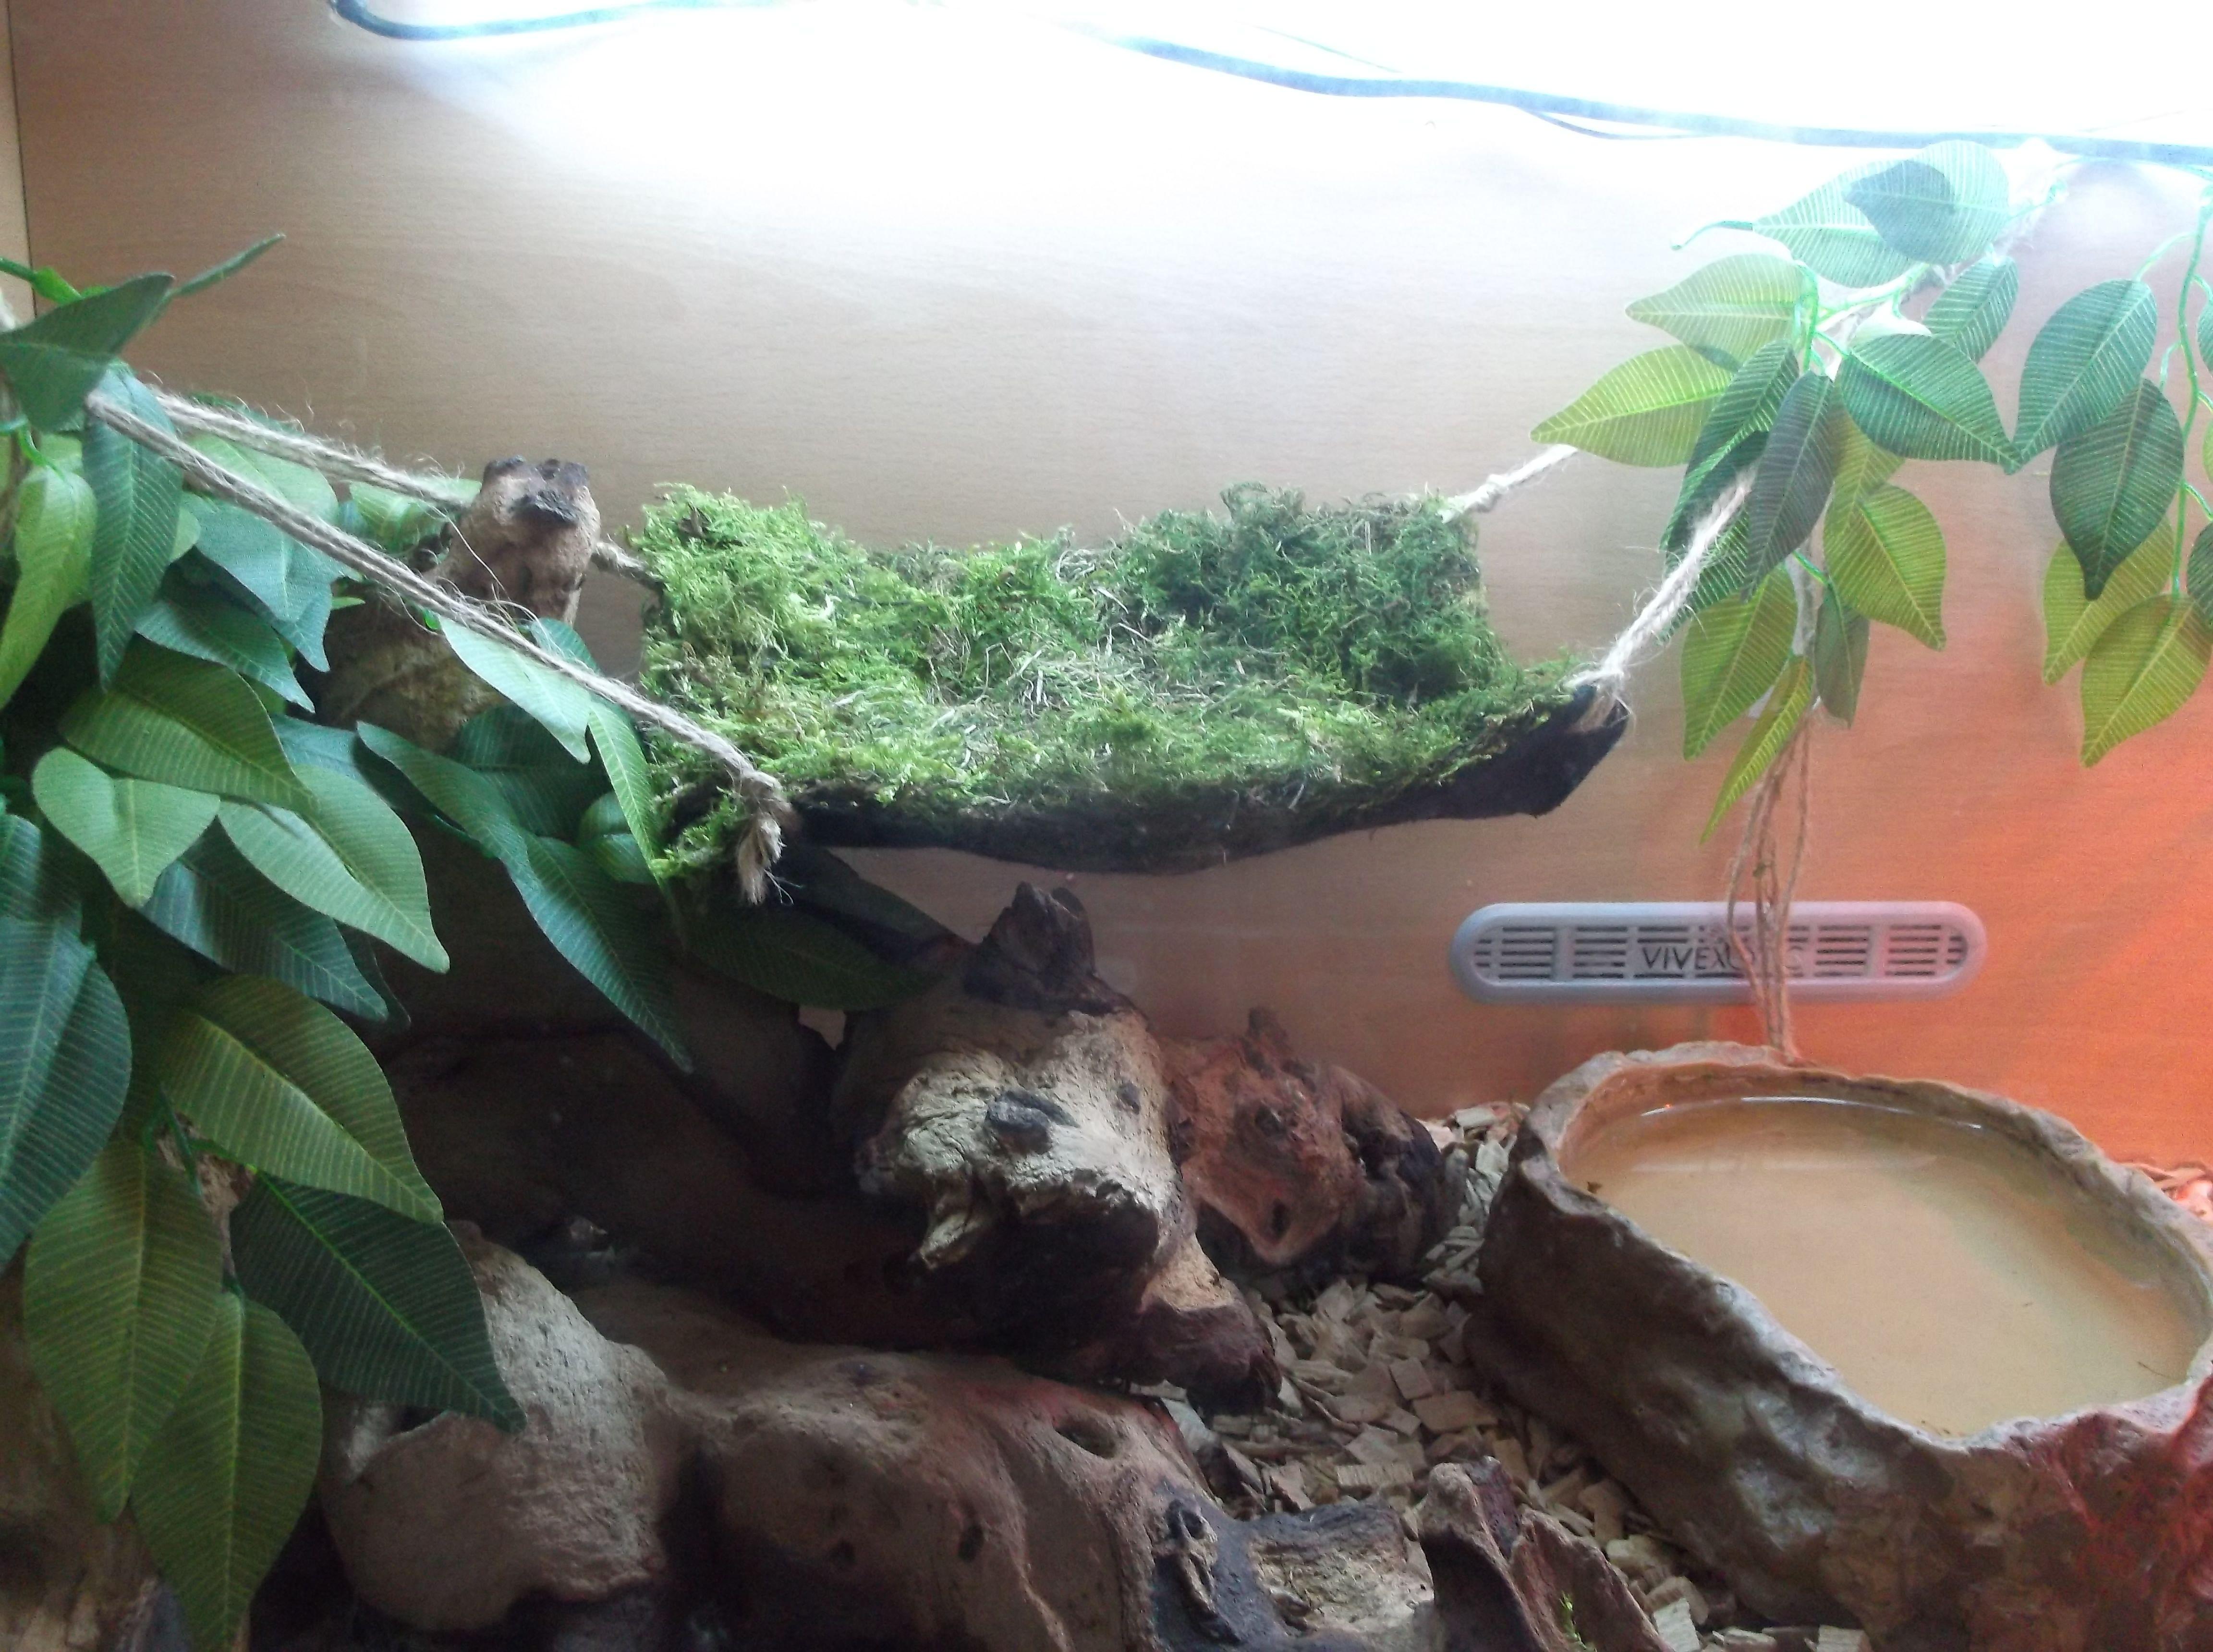 His new updated home hope he like his new hammock bearded dragon